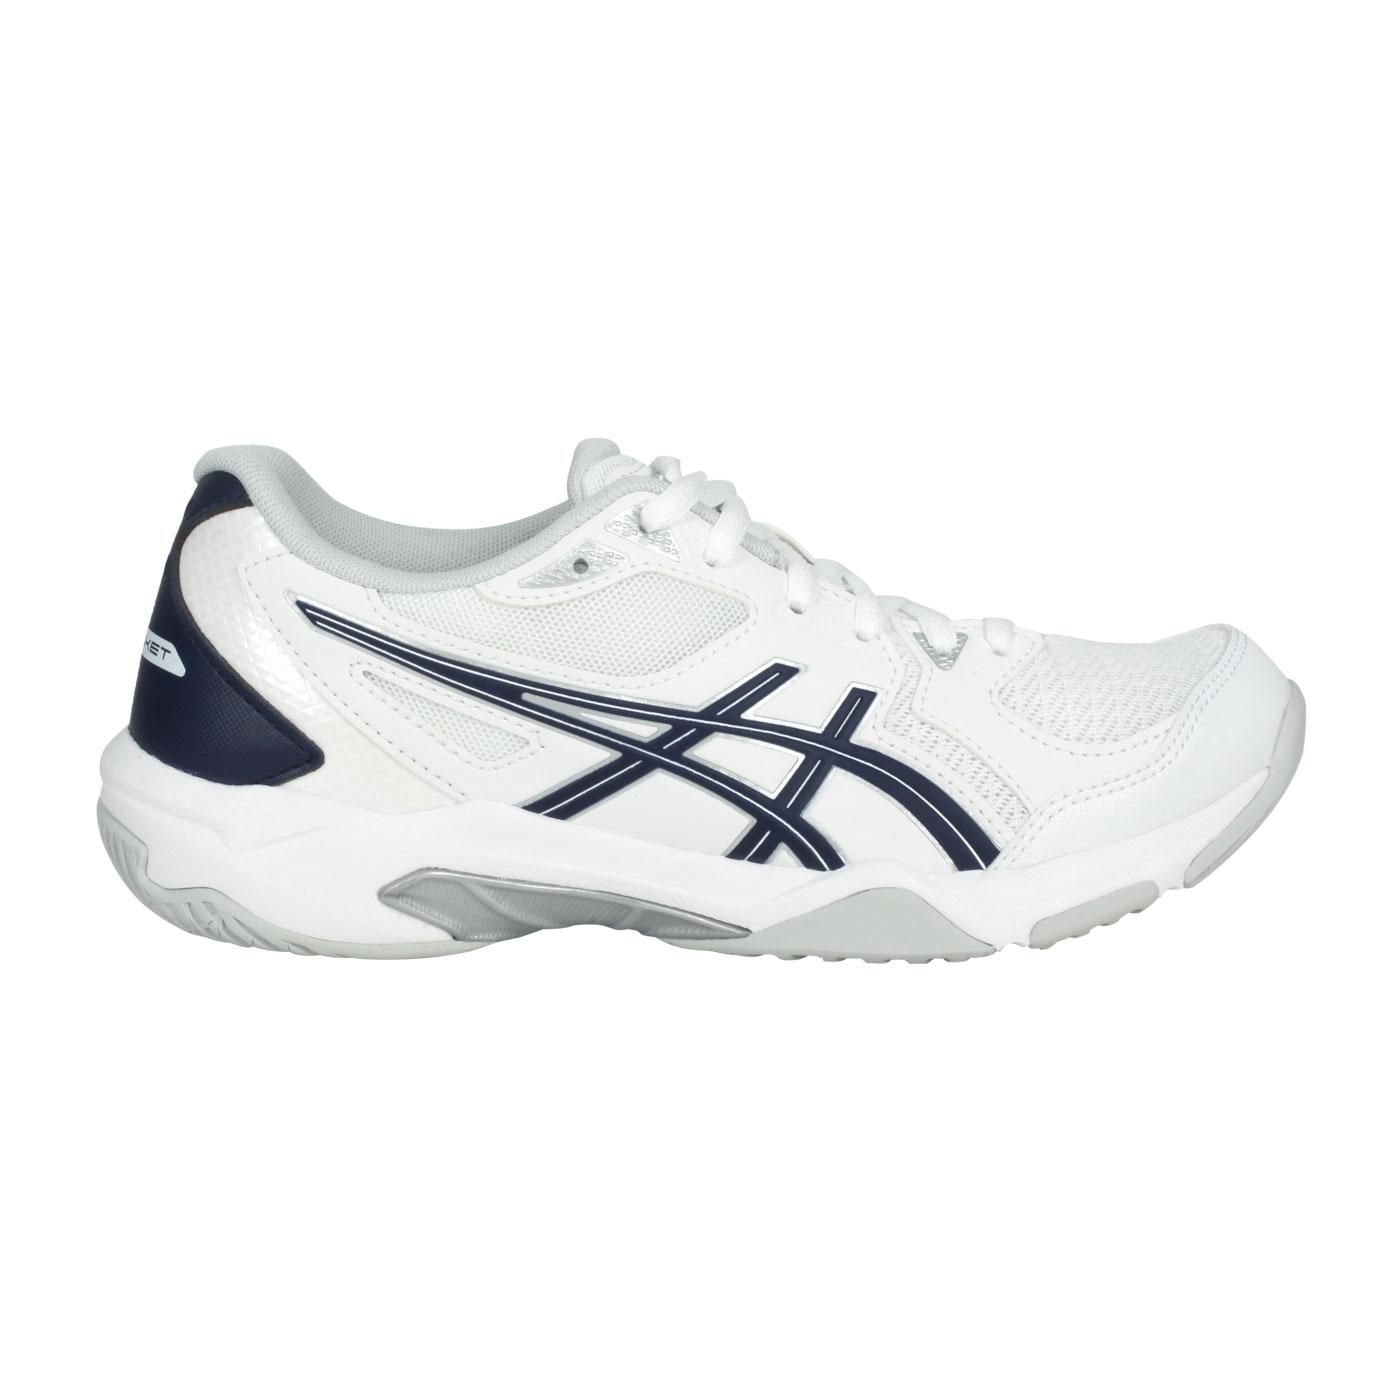 ASICS 女款排羽球鞋  @GEL-ROCKET 10@1072A056-101 - 白深藍灰